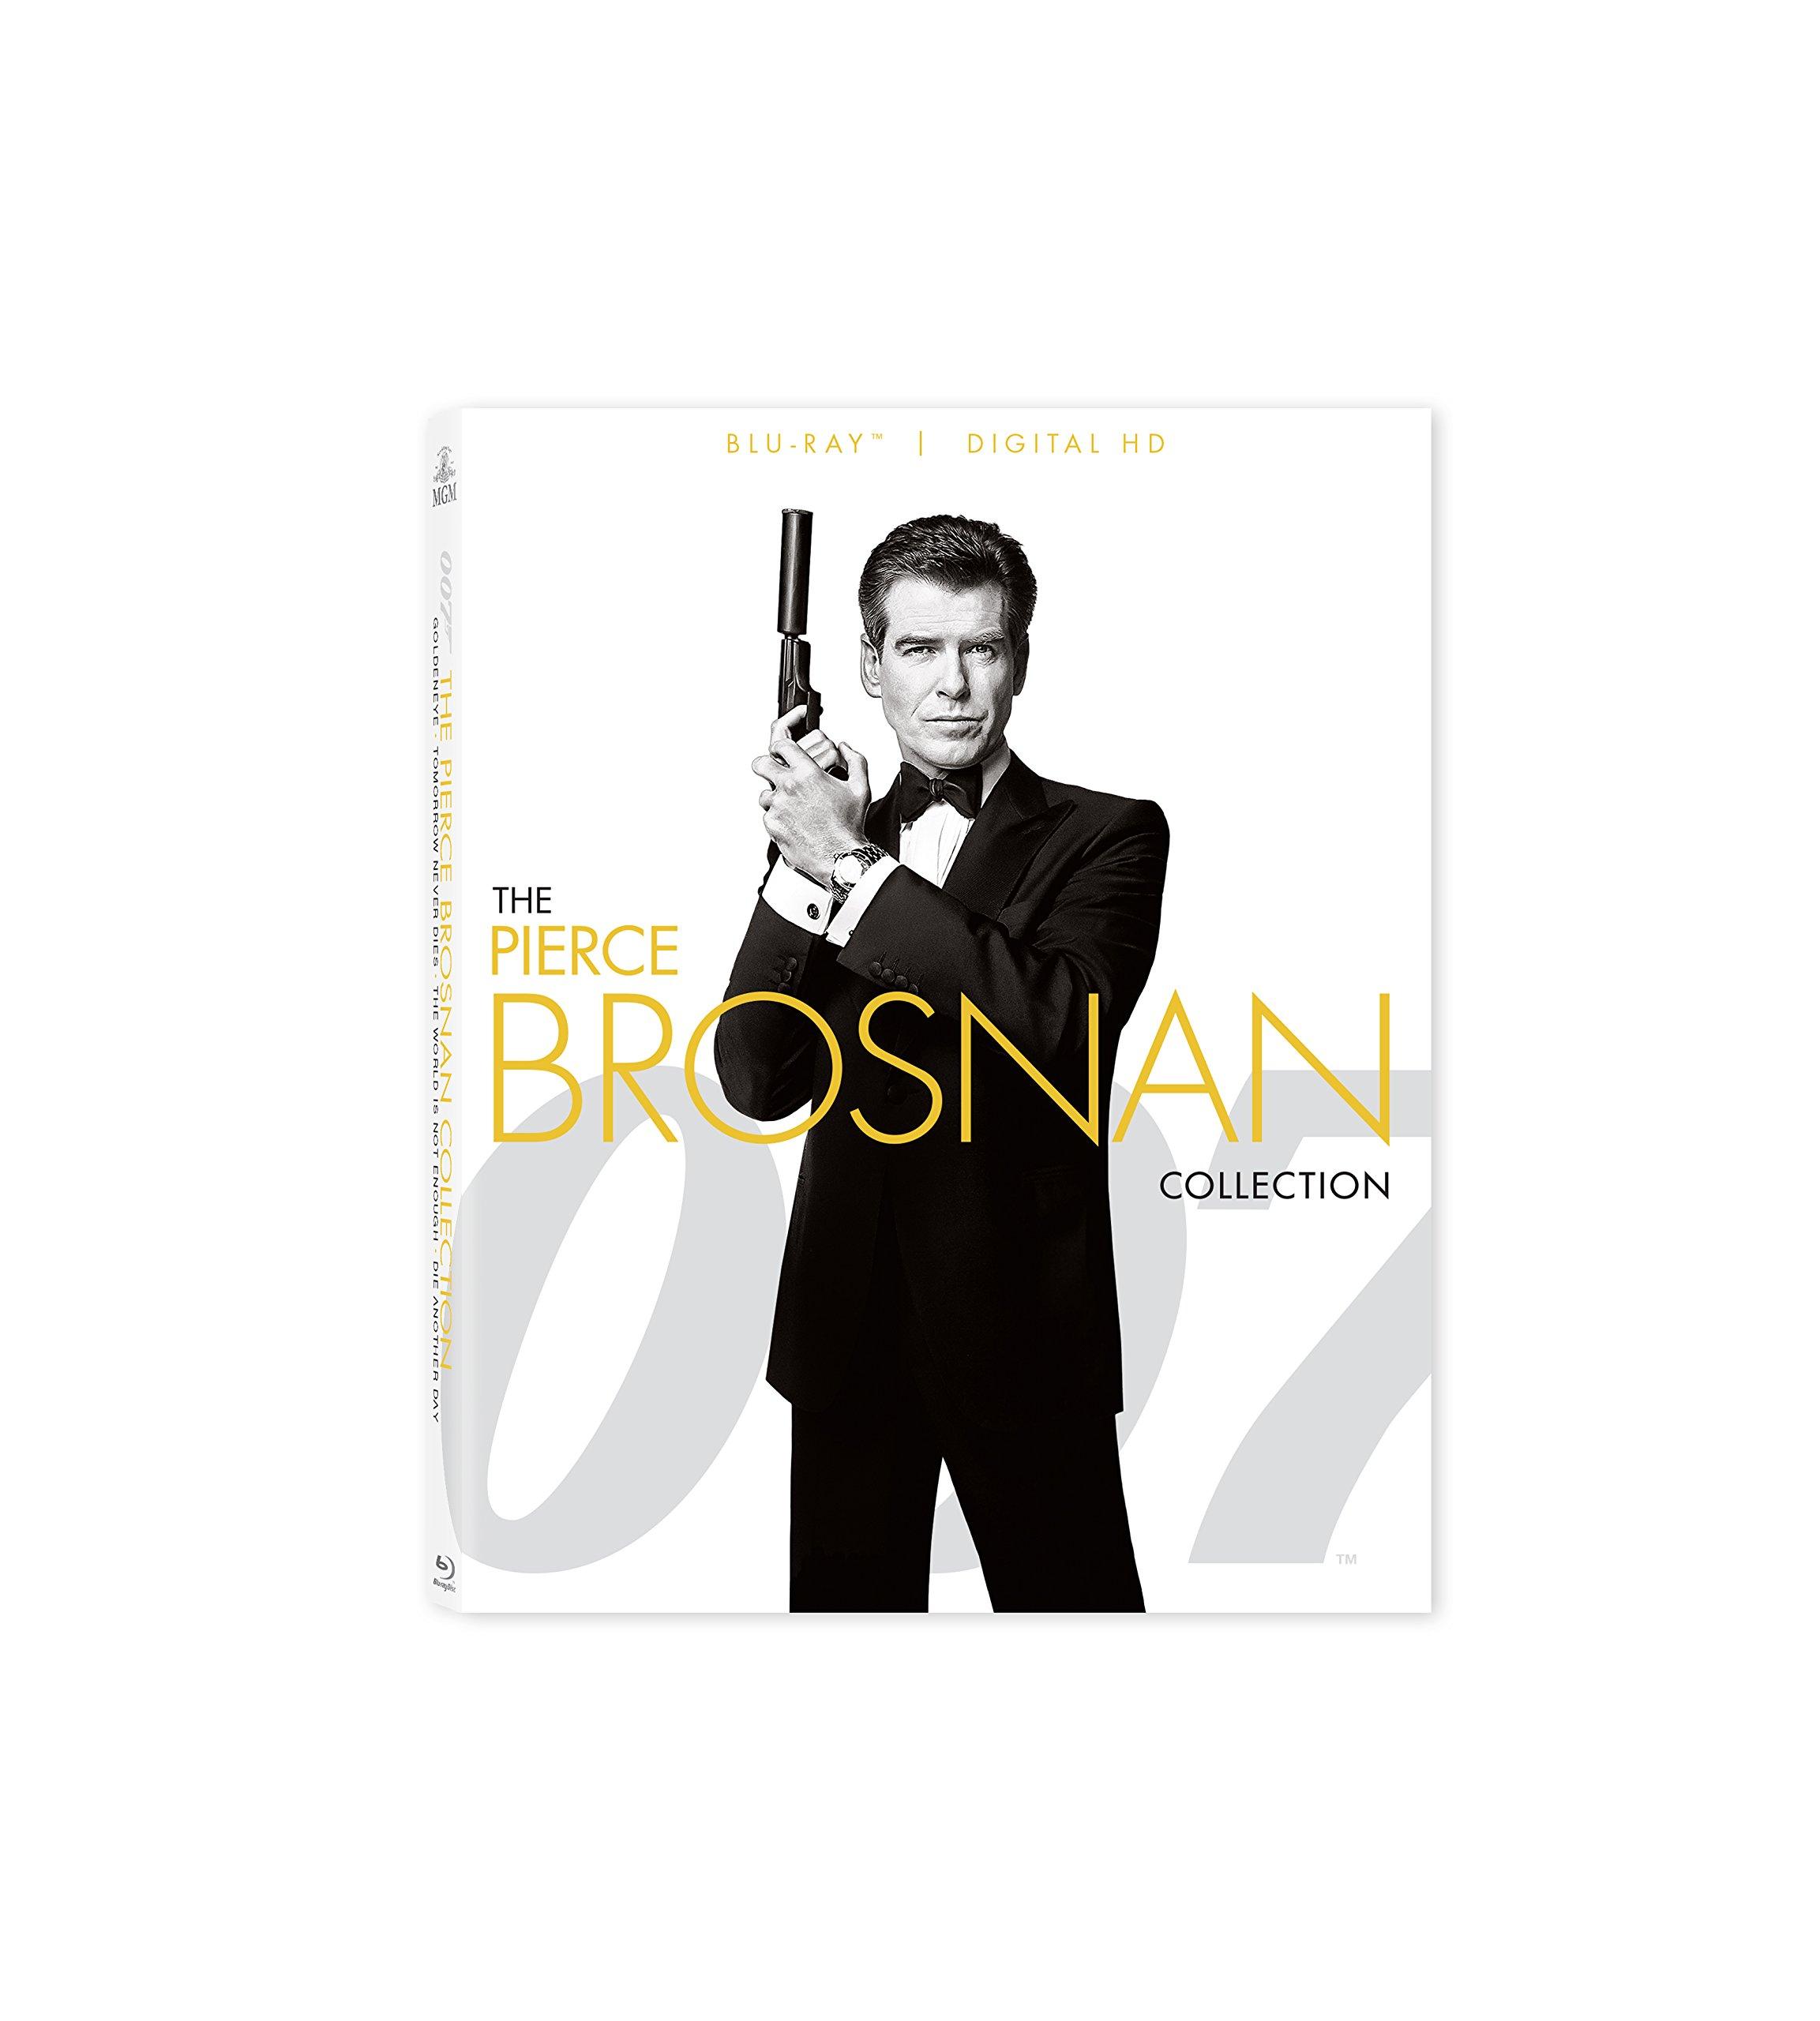 Blu-ray : The Pierce Brosnan Collection (Widescreen)